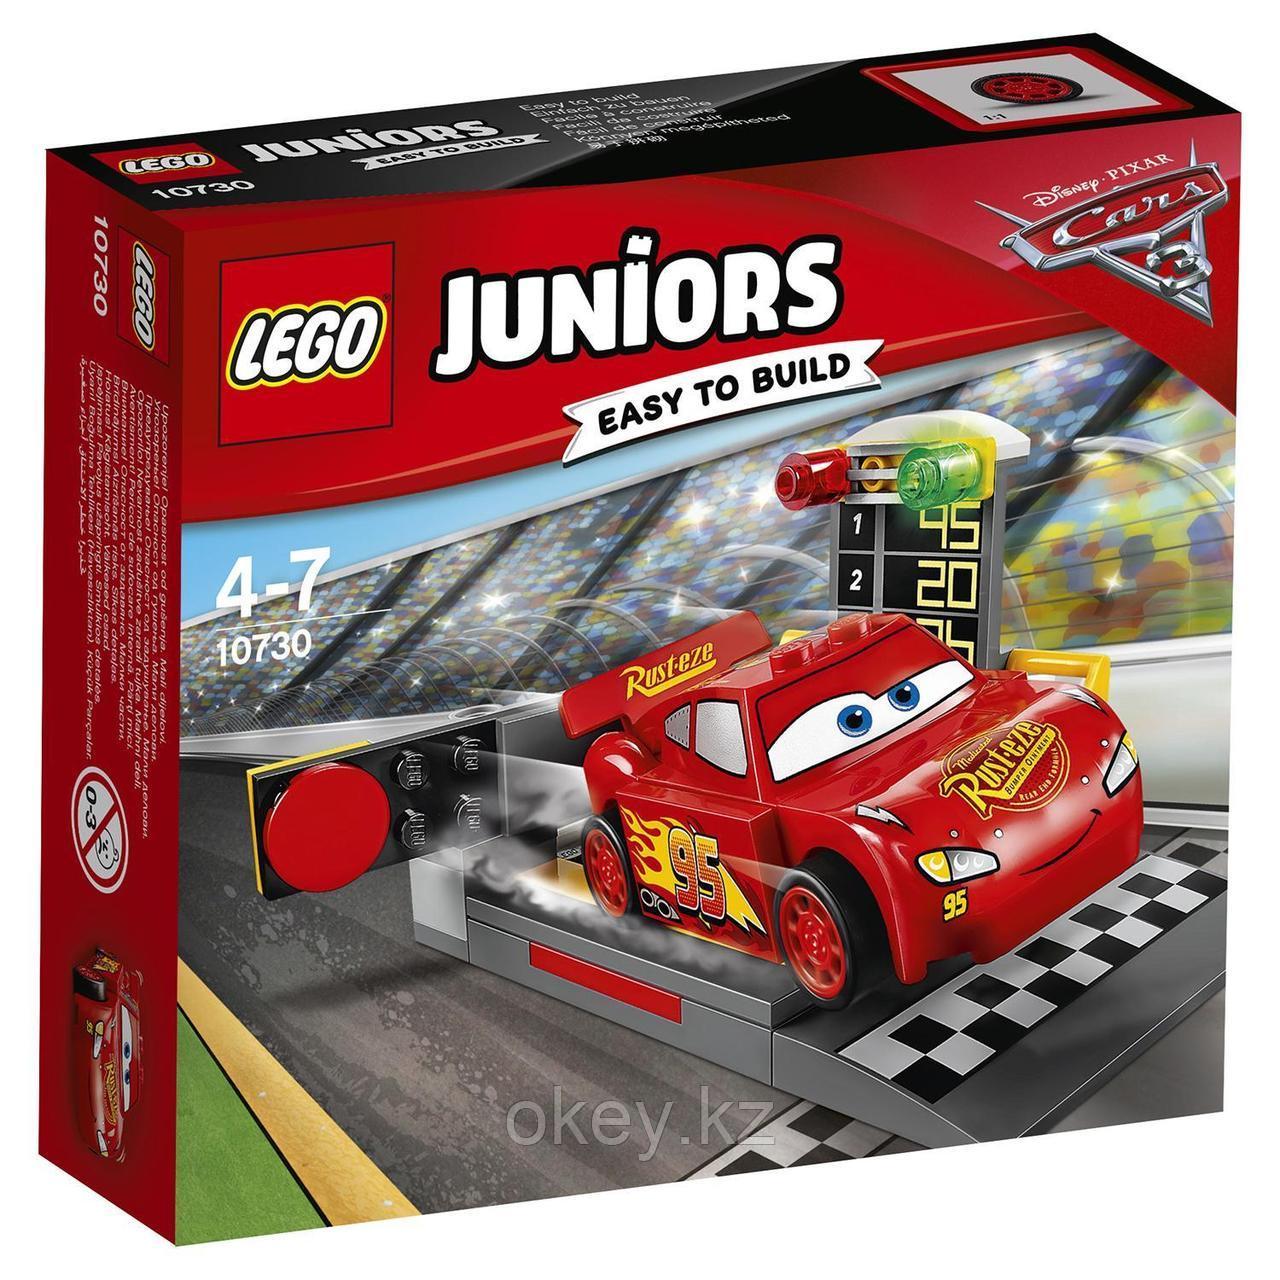 LEGO Juniors: Устройство для запуска Молнии МакКуина 10730